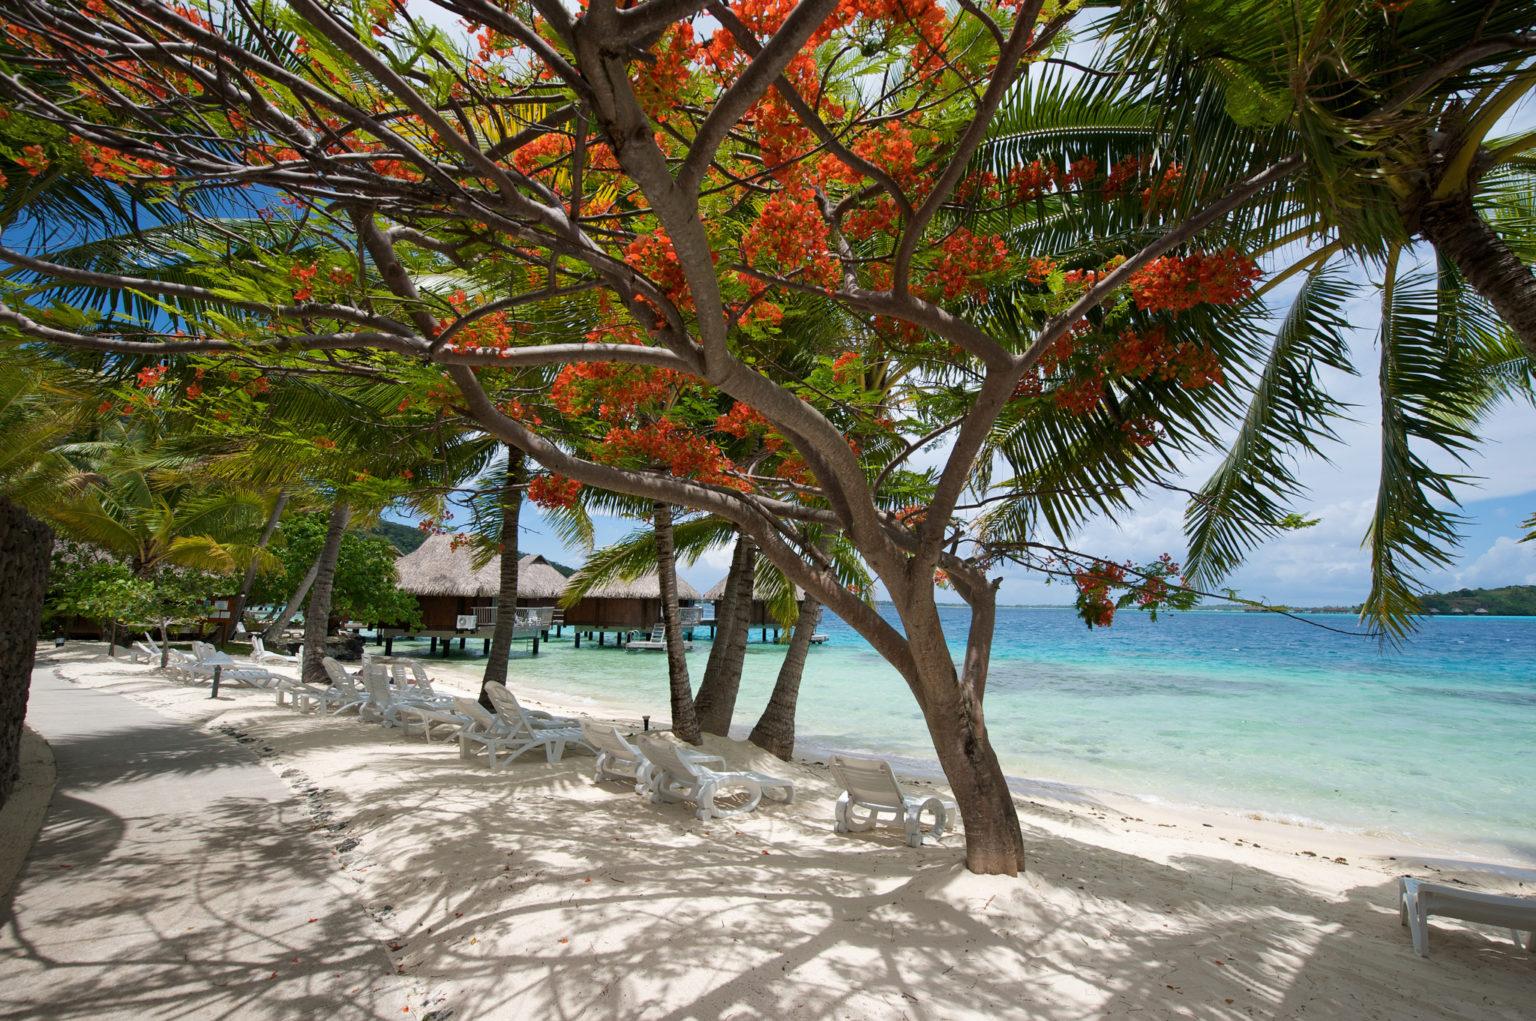 Soggiorno in Polinesia Francese in hotel 3 stelle - Go ...